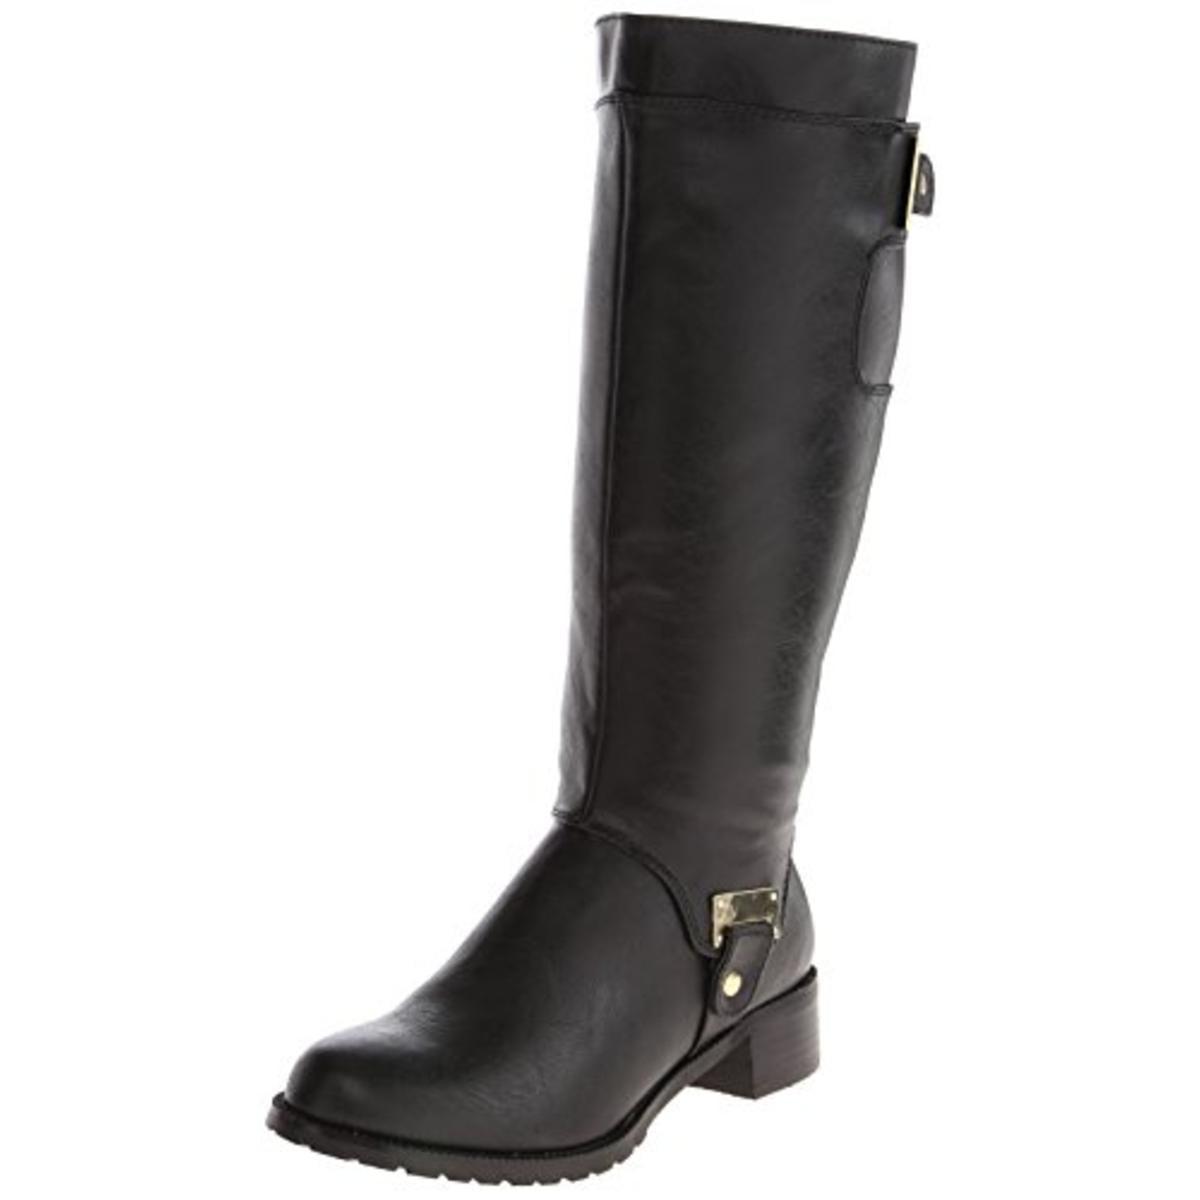 Bella Vita Womens Anya II Plus Wide Calf Faux Leather Riding Boots by Bella Vita